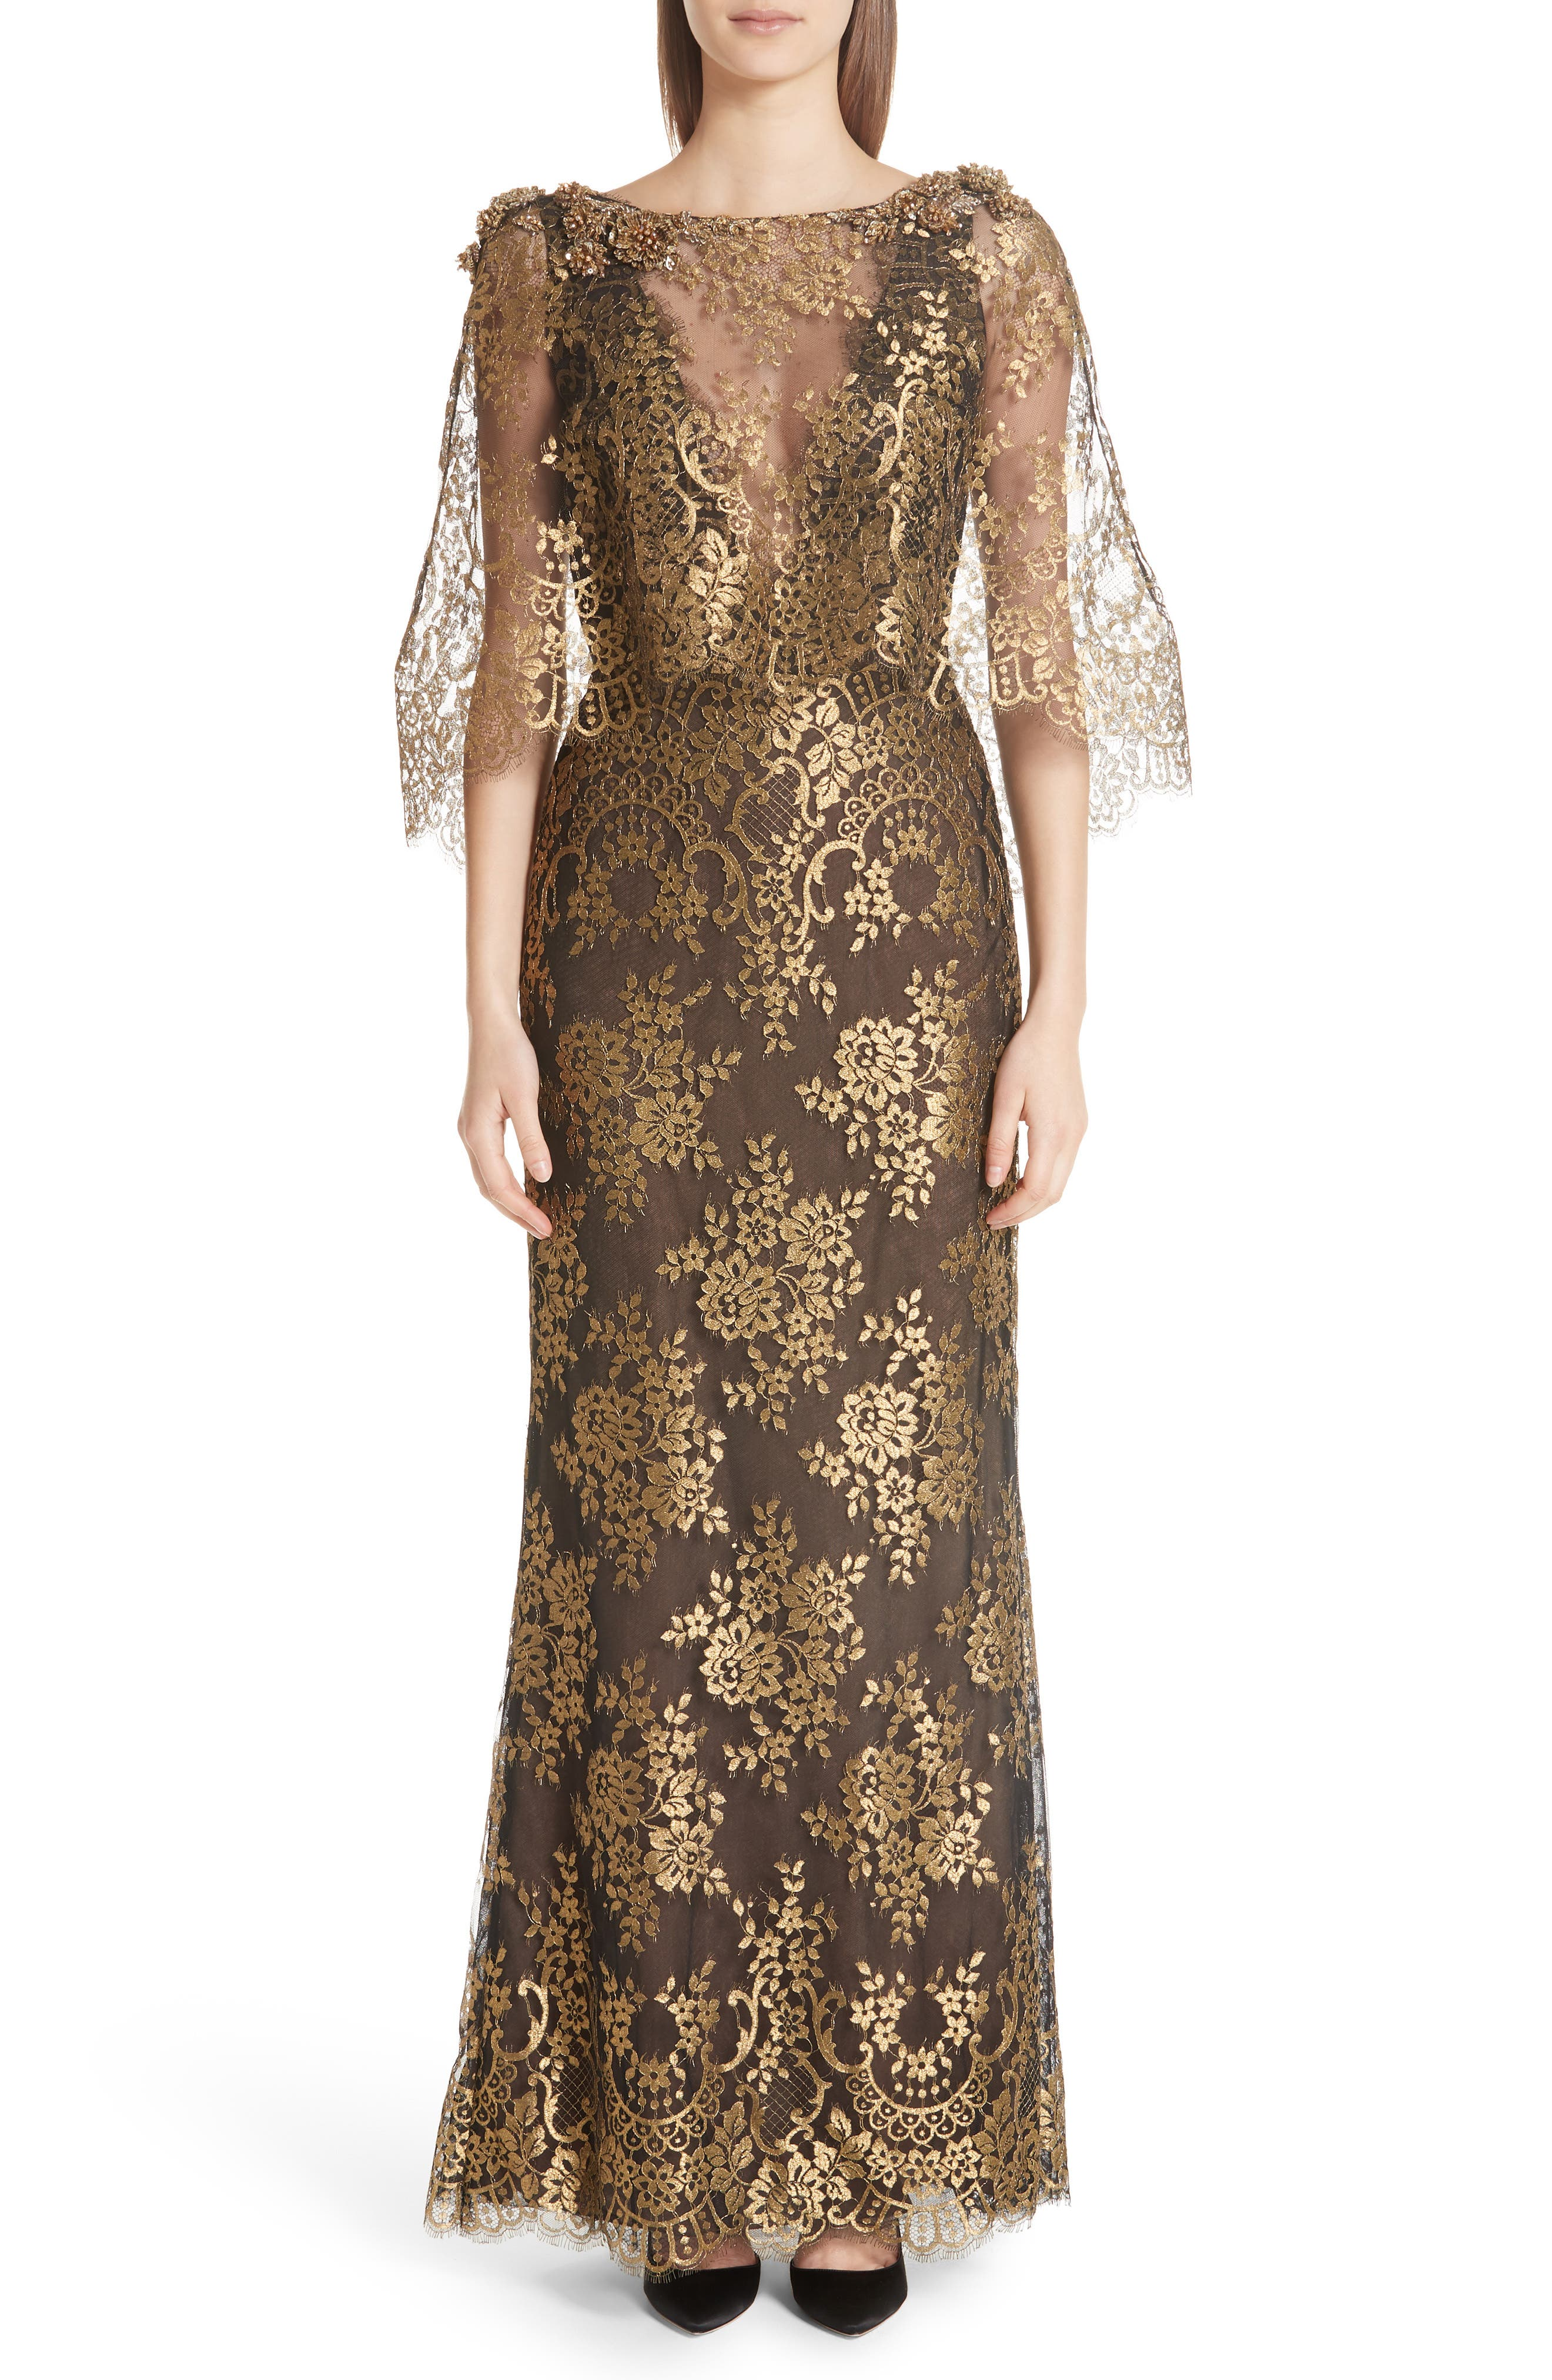 Edwardian Ladies Clothing – 1900, 1910s, Titanic Era Womens Marchesa Cape Detail Metallic Lace Gown Size 14 - Black $4,995.00 AT vintagedancer.com